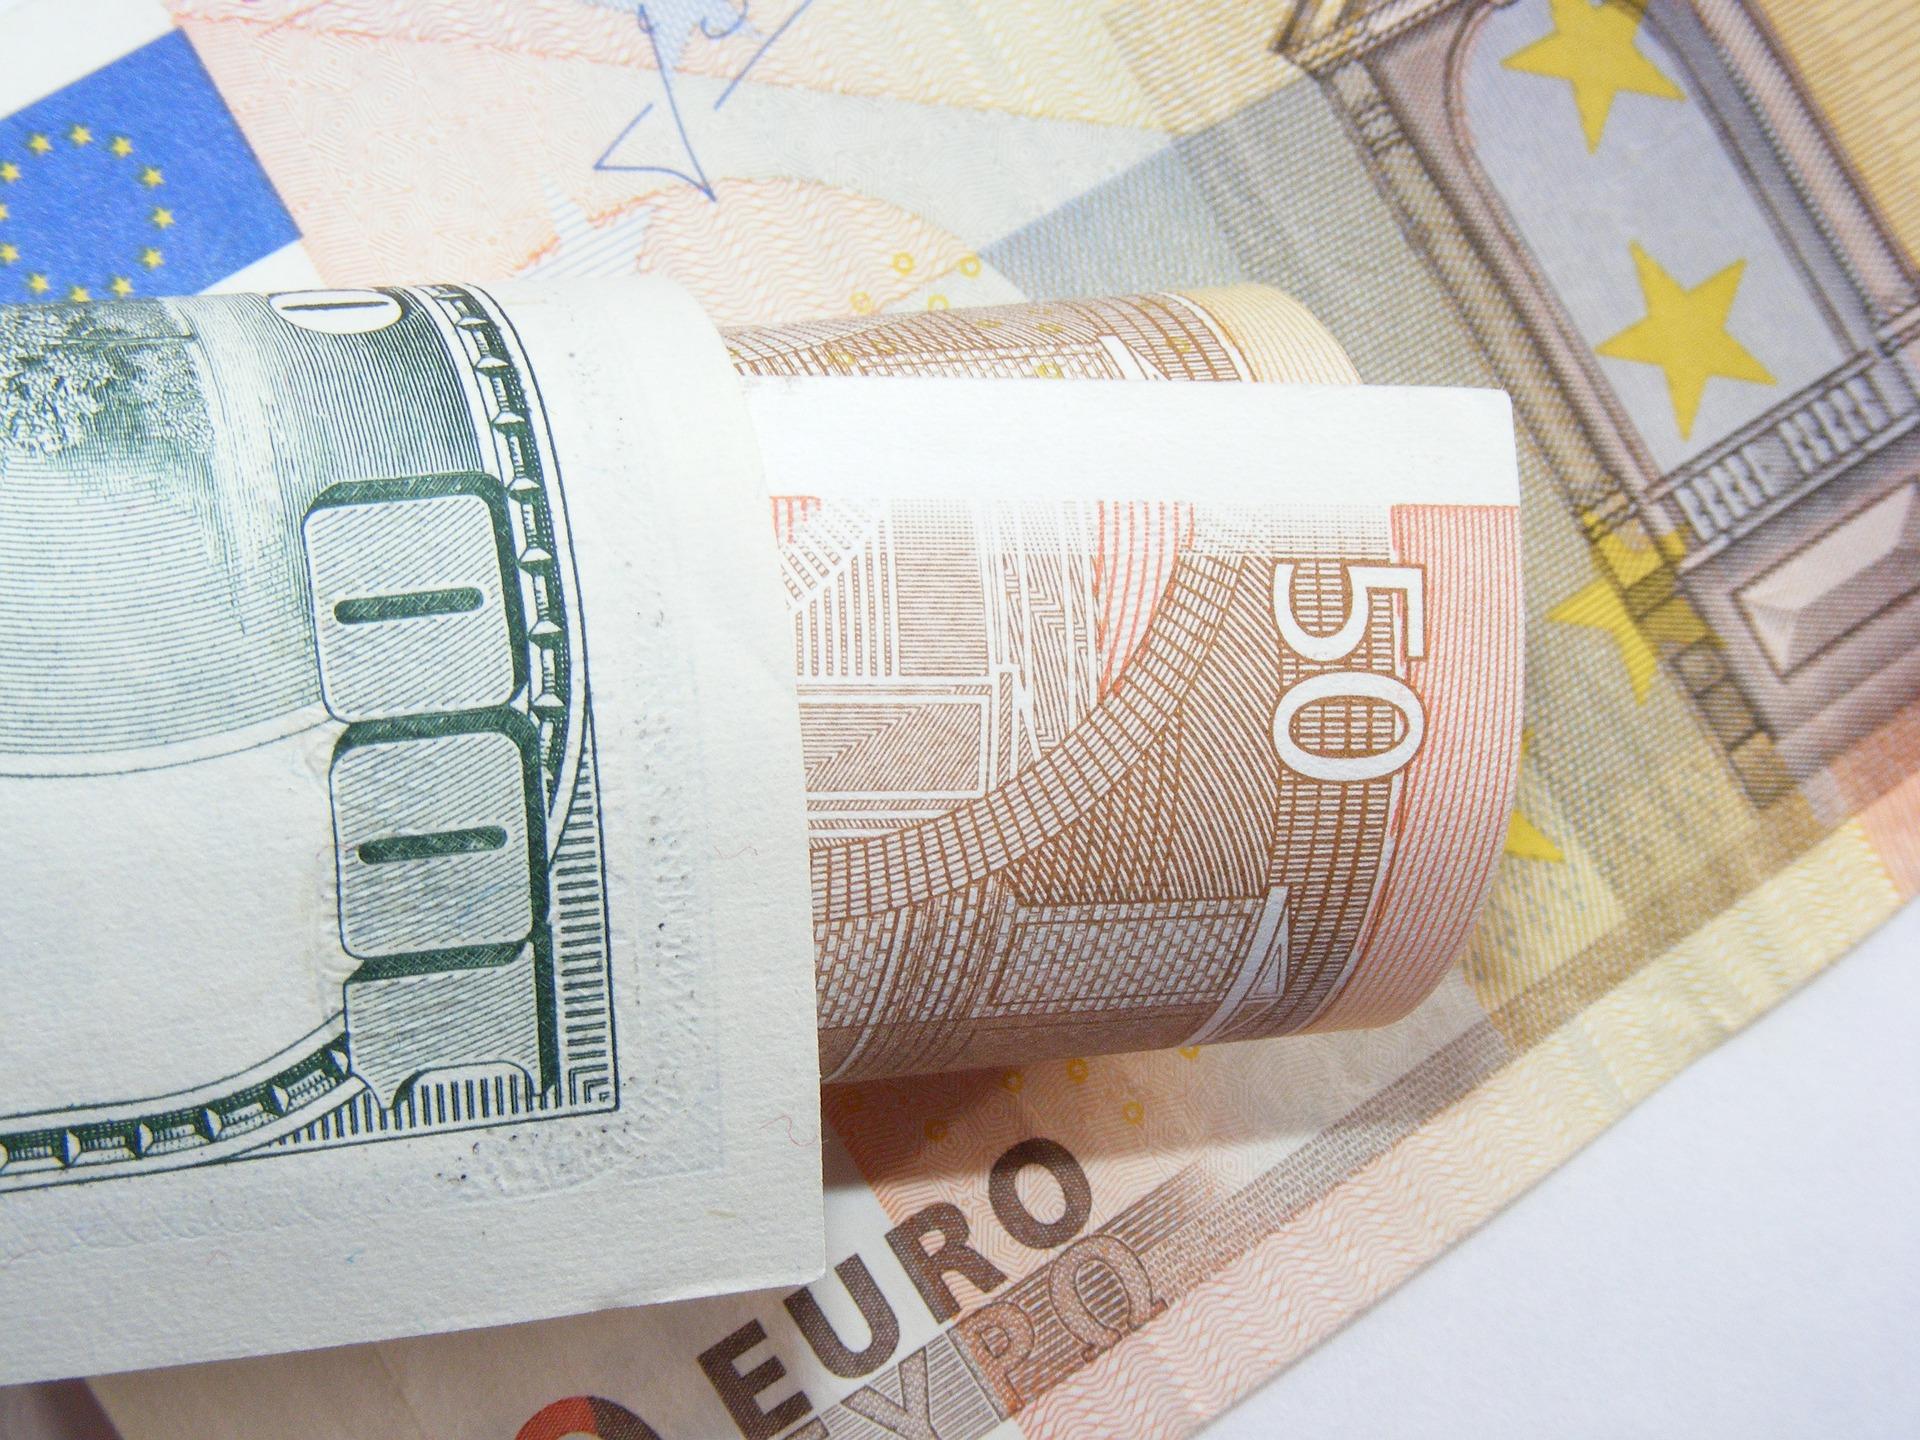 Legg Mason Adds International High Dividend ETF That Limits Volatility